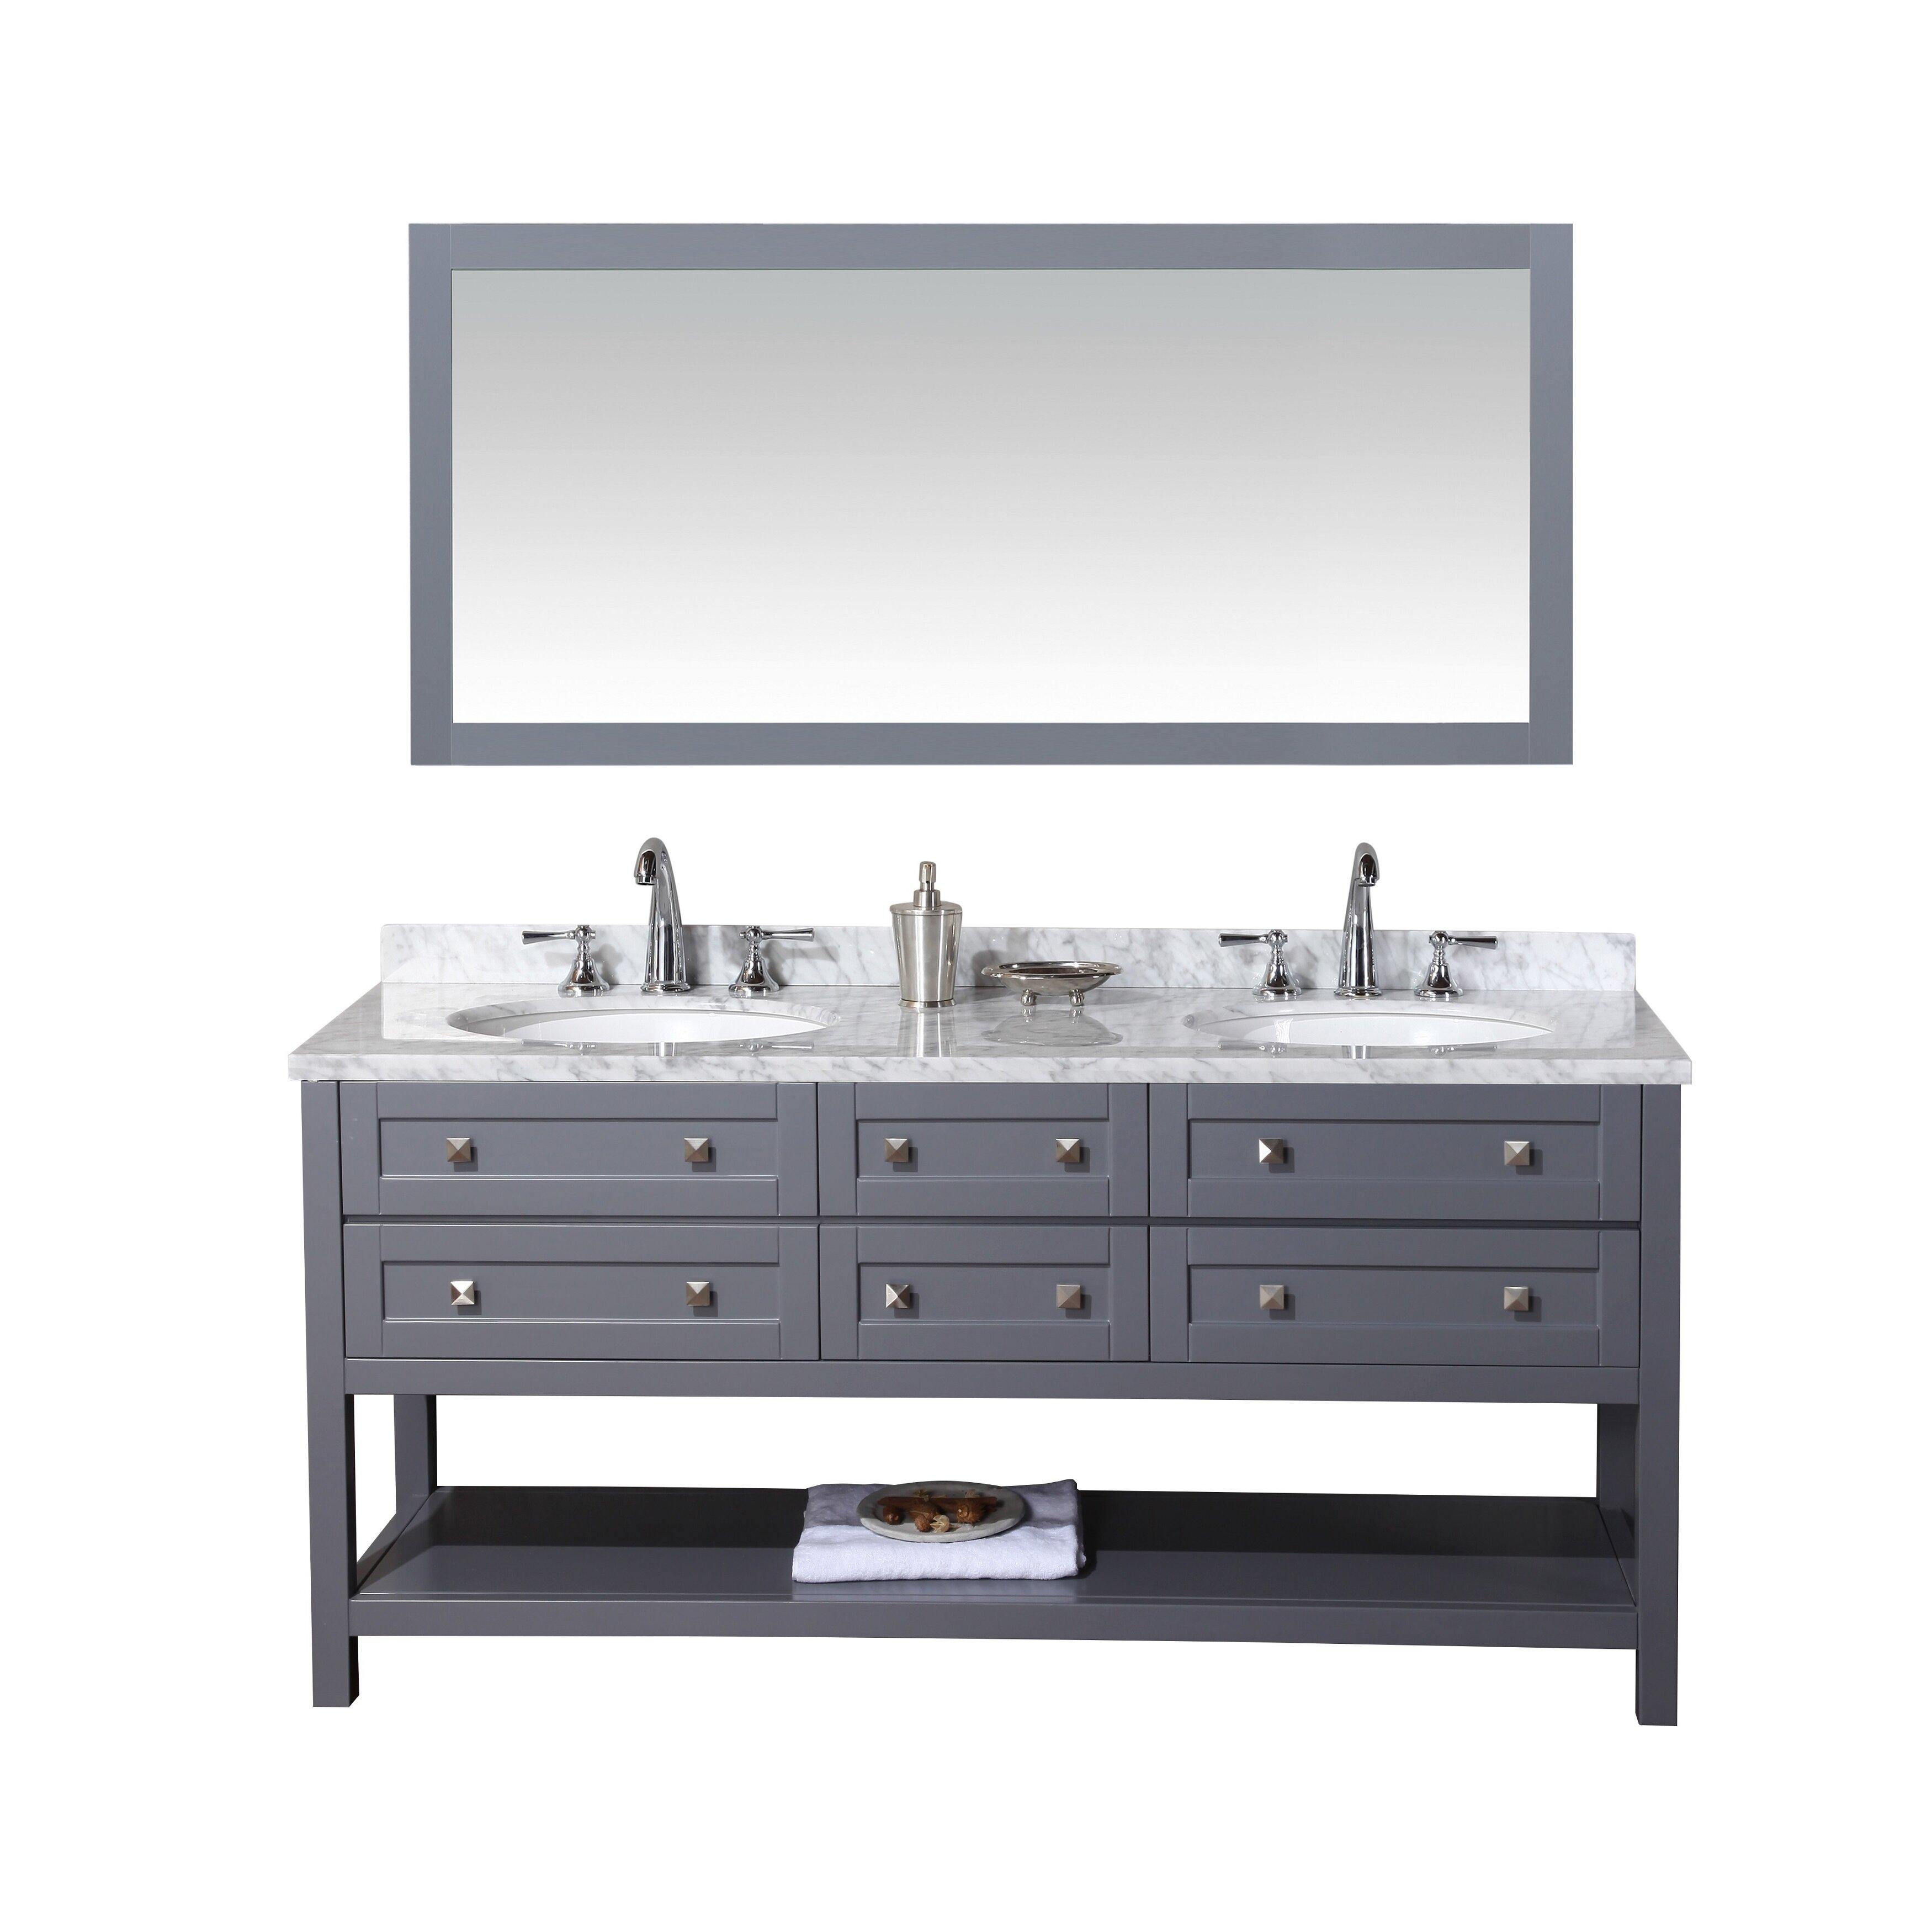 Dcor Design Albia 72 Double Modern Bathroom Vanity Set